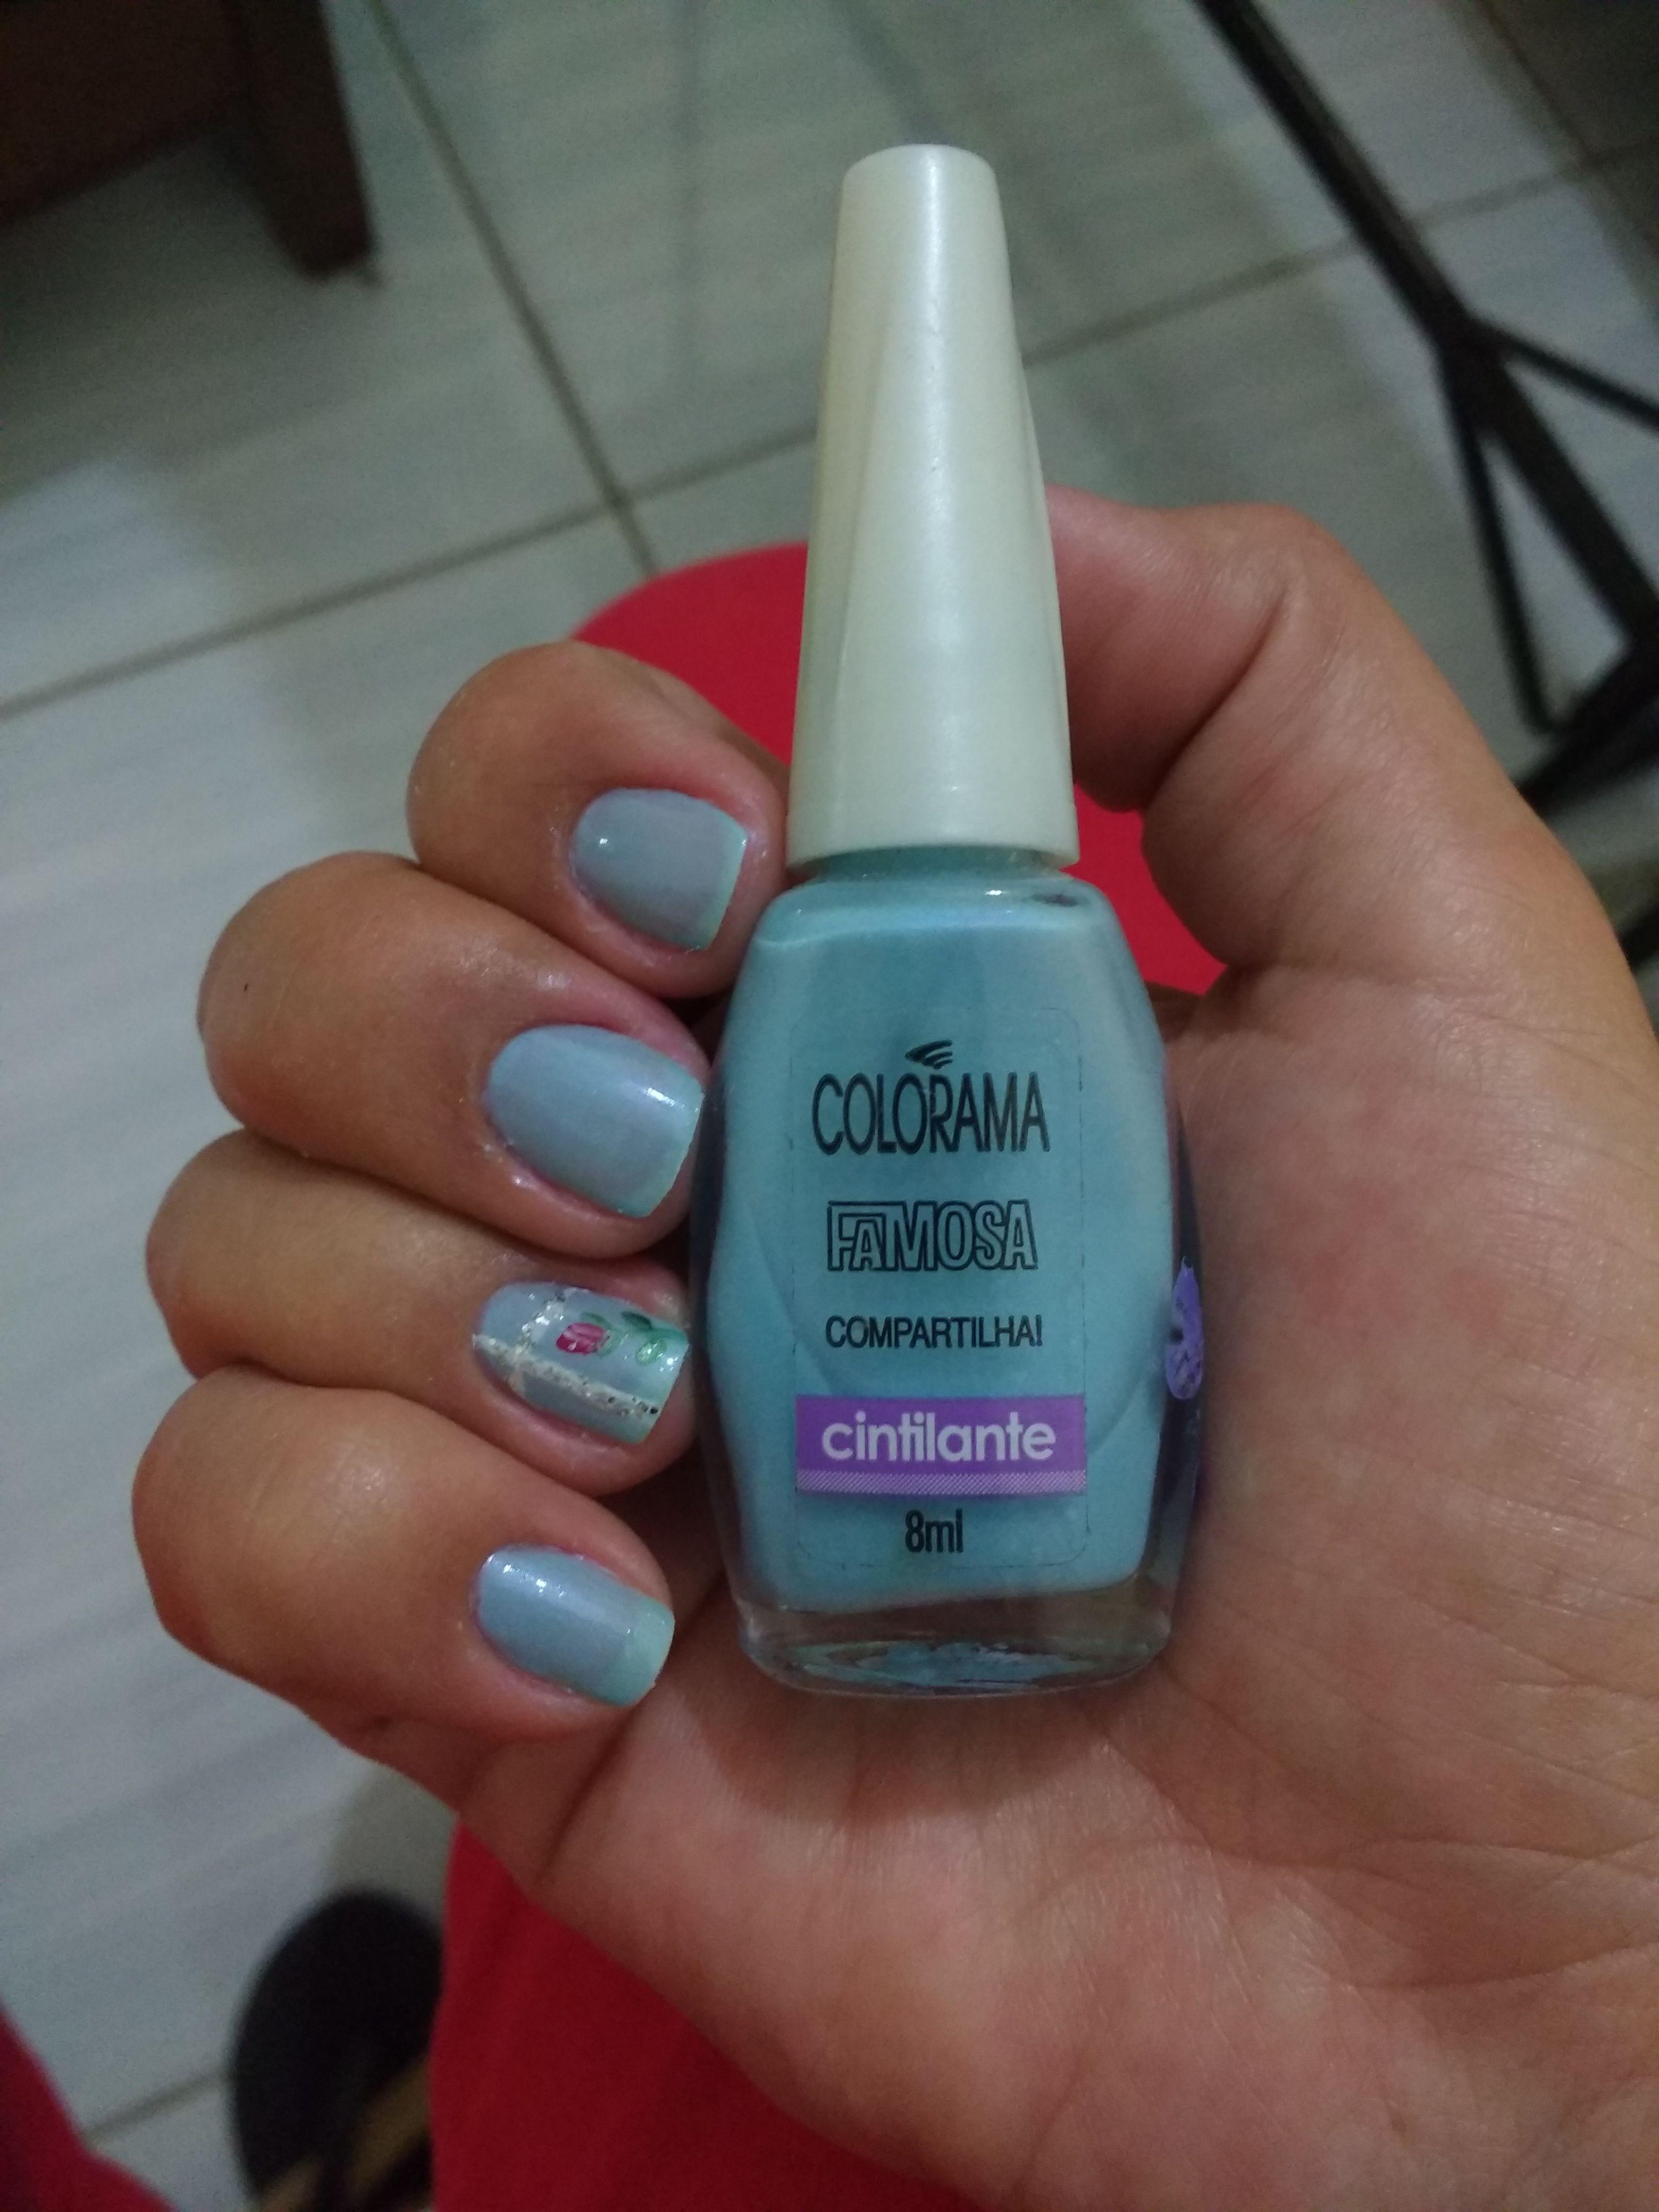 Esmalte Compartilha! da Colorama coelção Famosa Esmalte azul claro ...